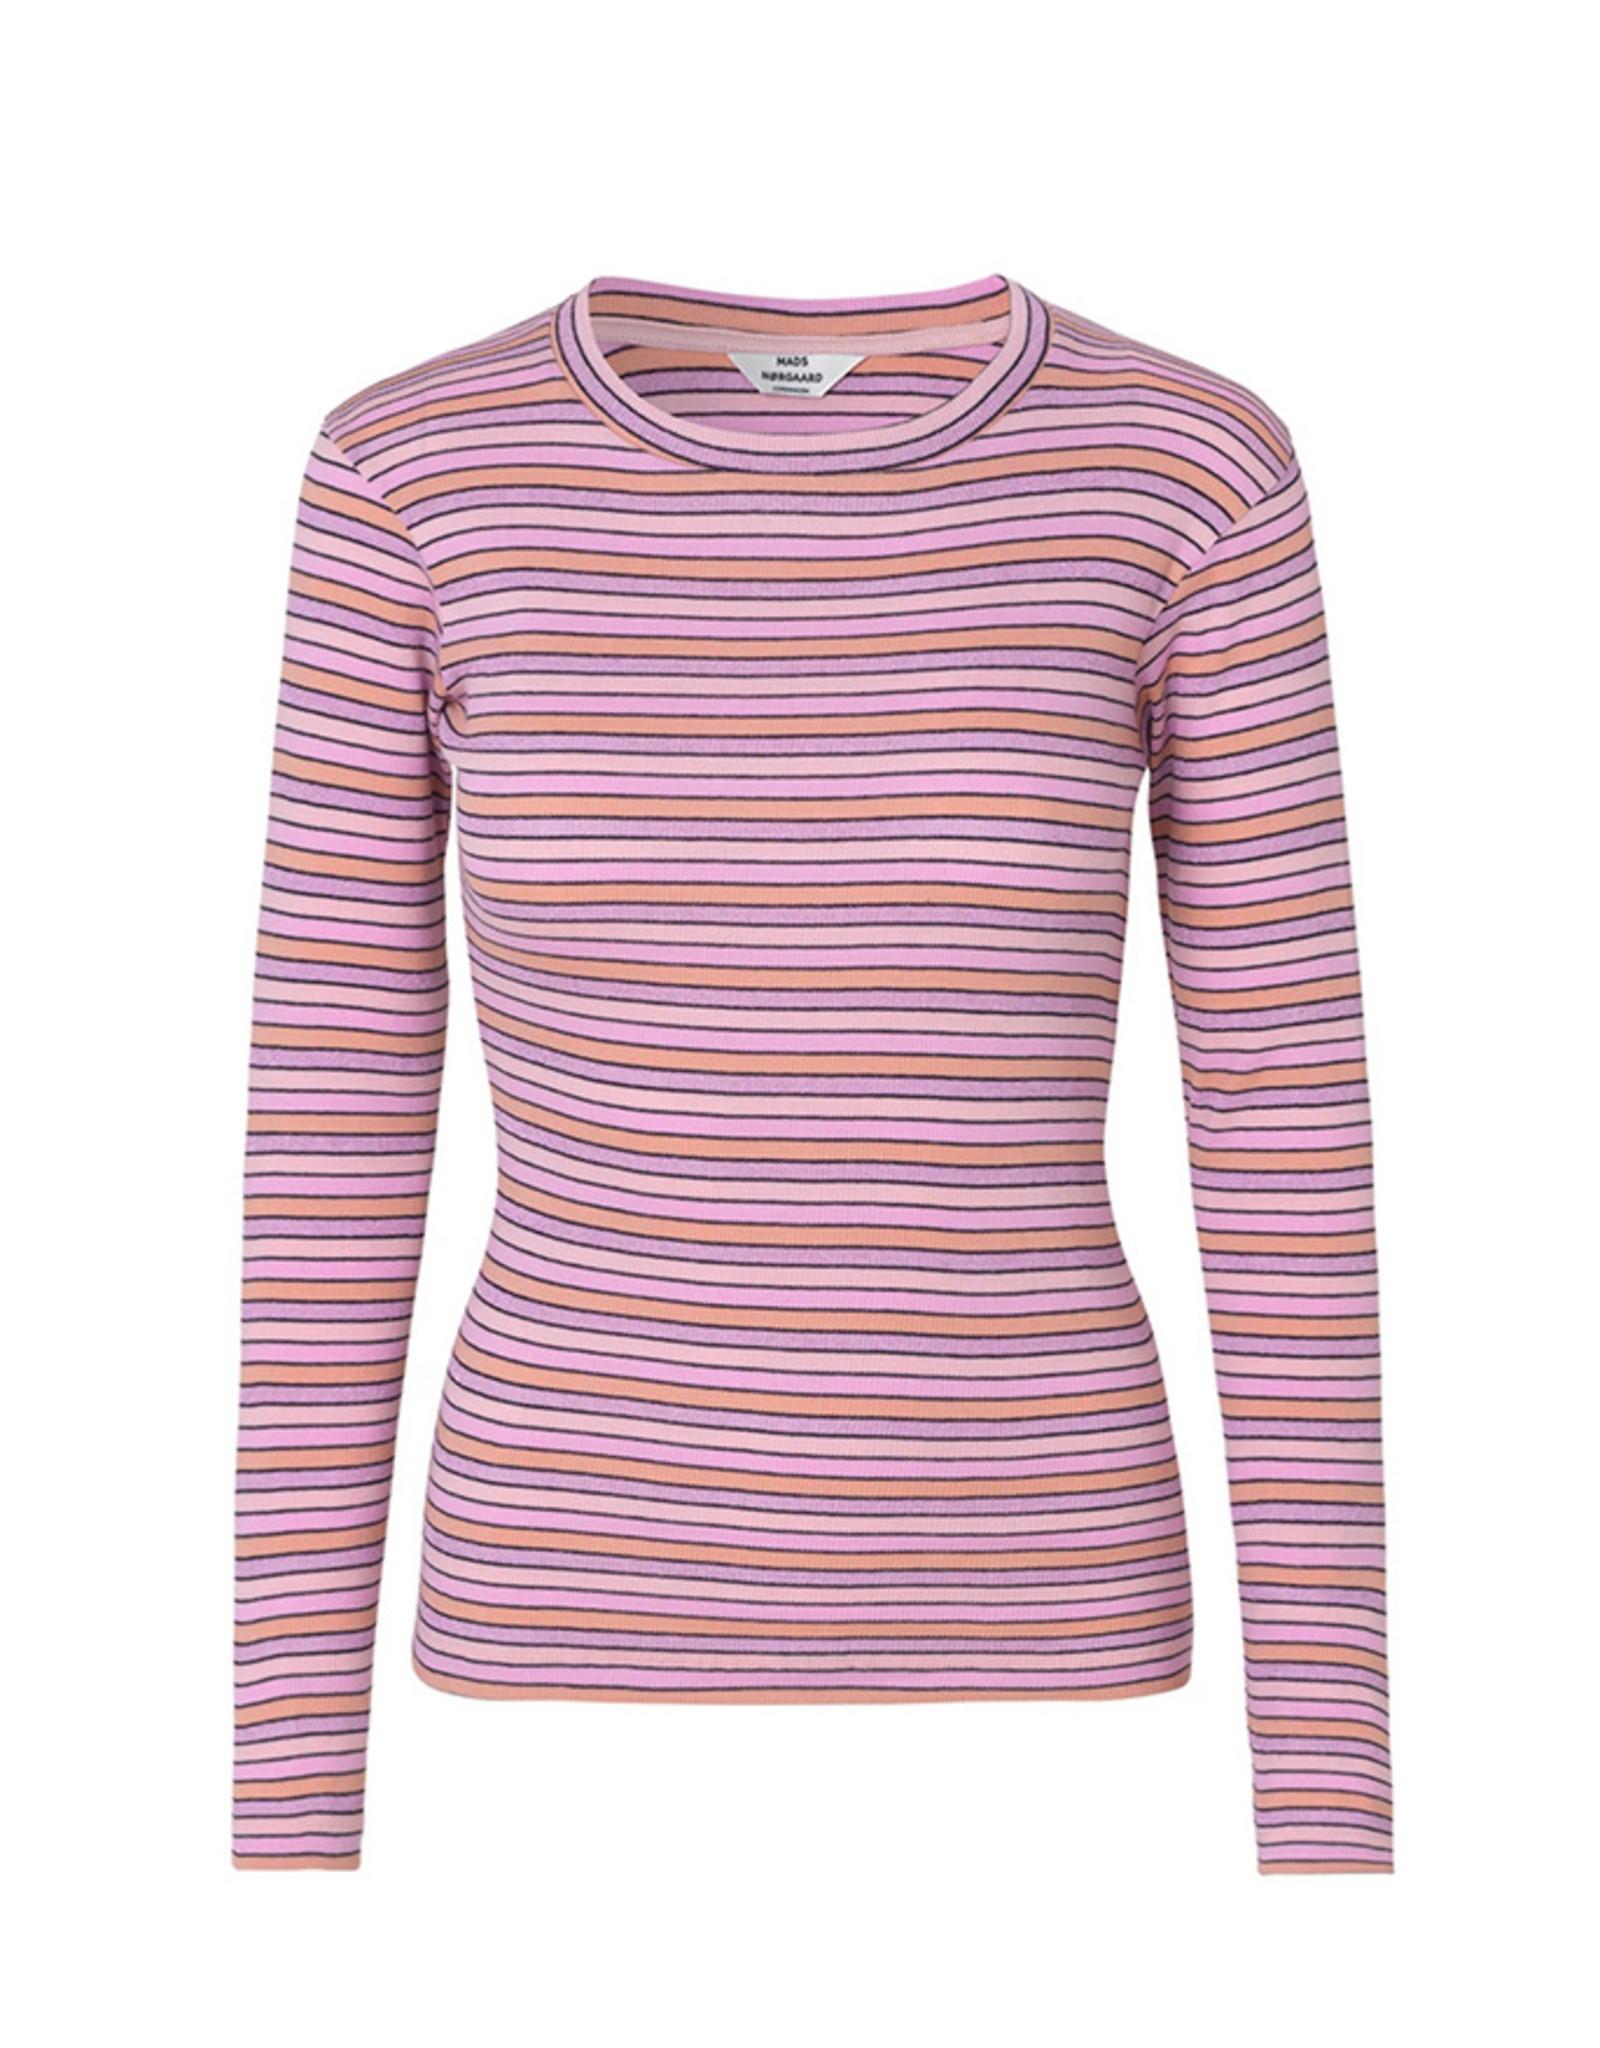 Tuba LS Pink Stripe